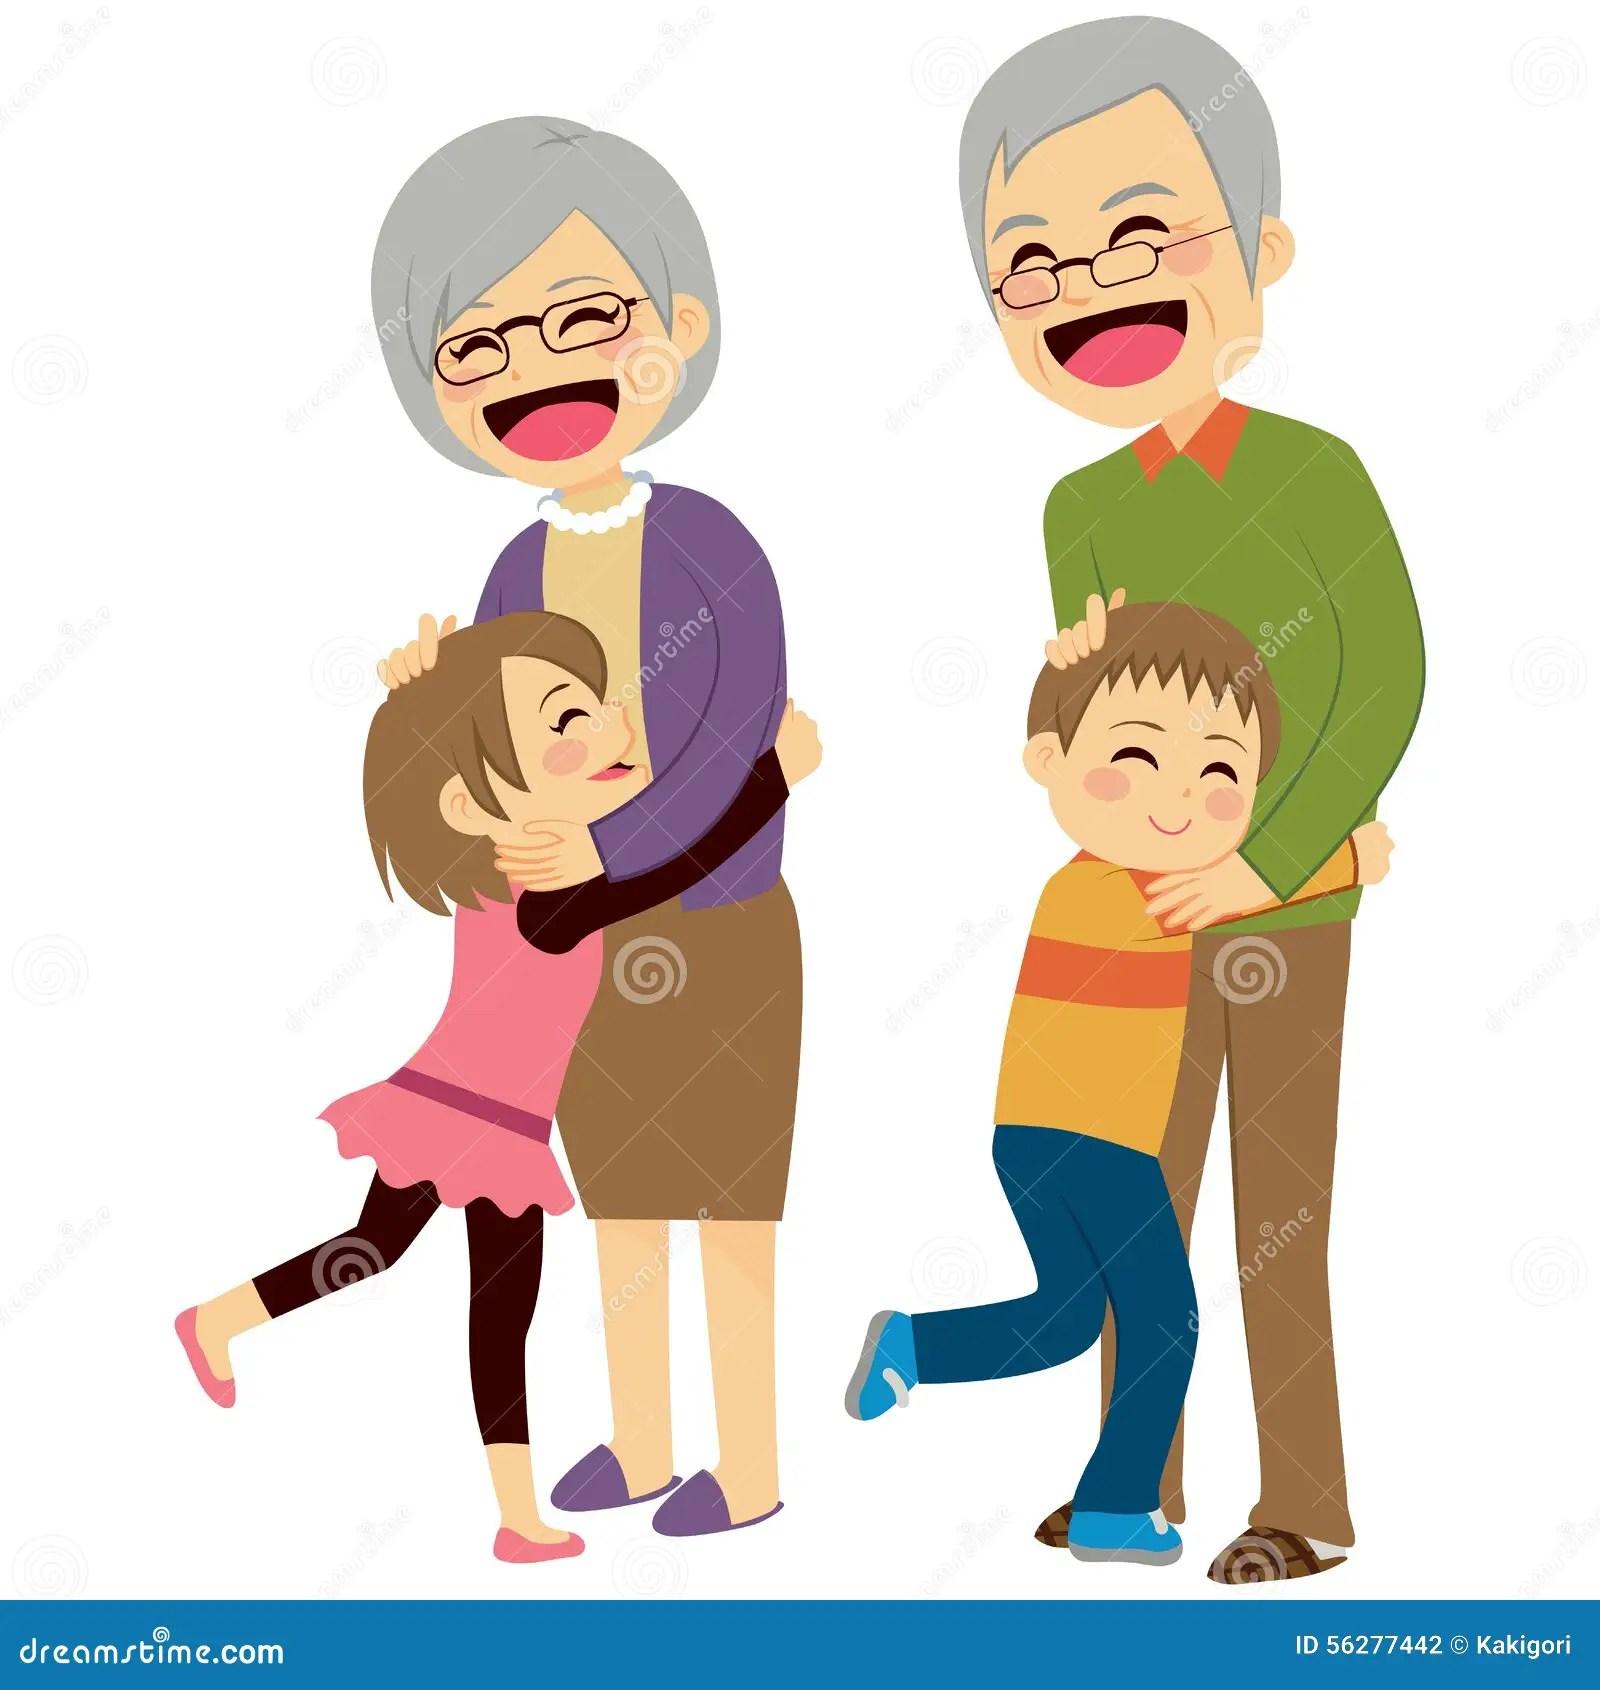 Persona 4 The Animation Wallpaper Grandchildren Hugging Grandparents Stock Vector